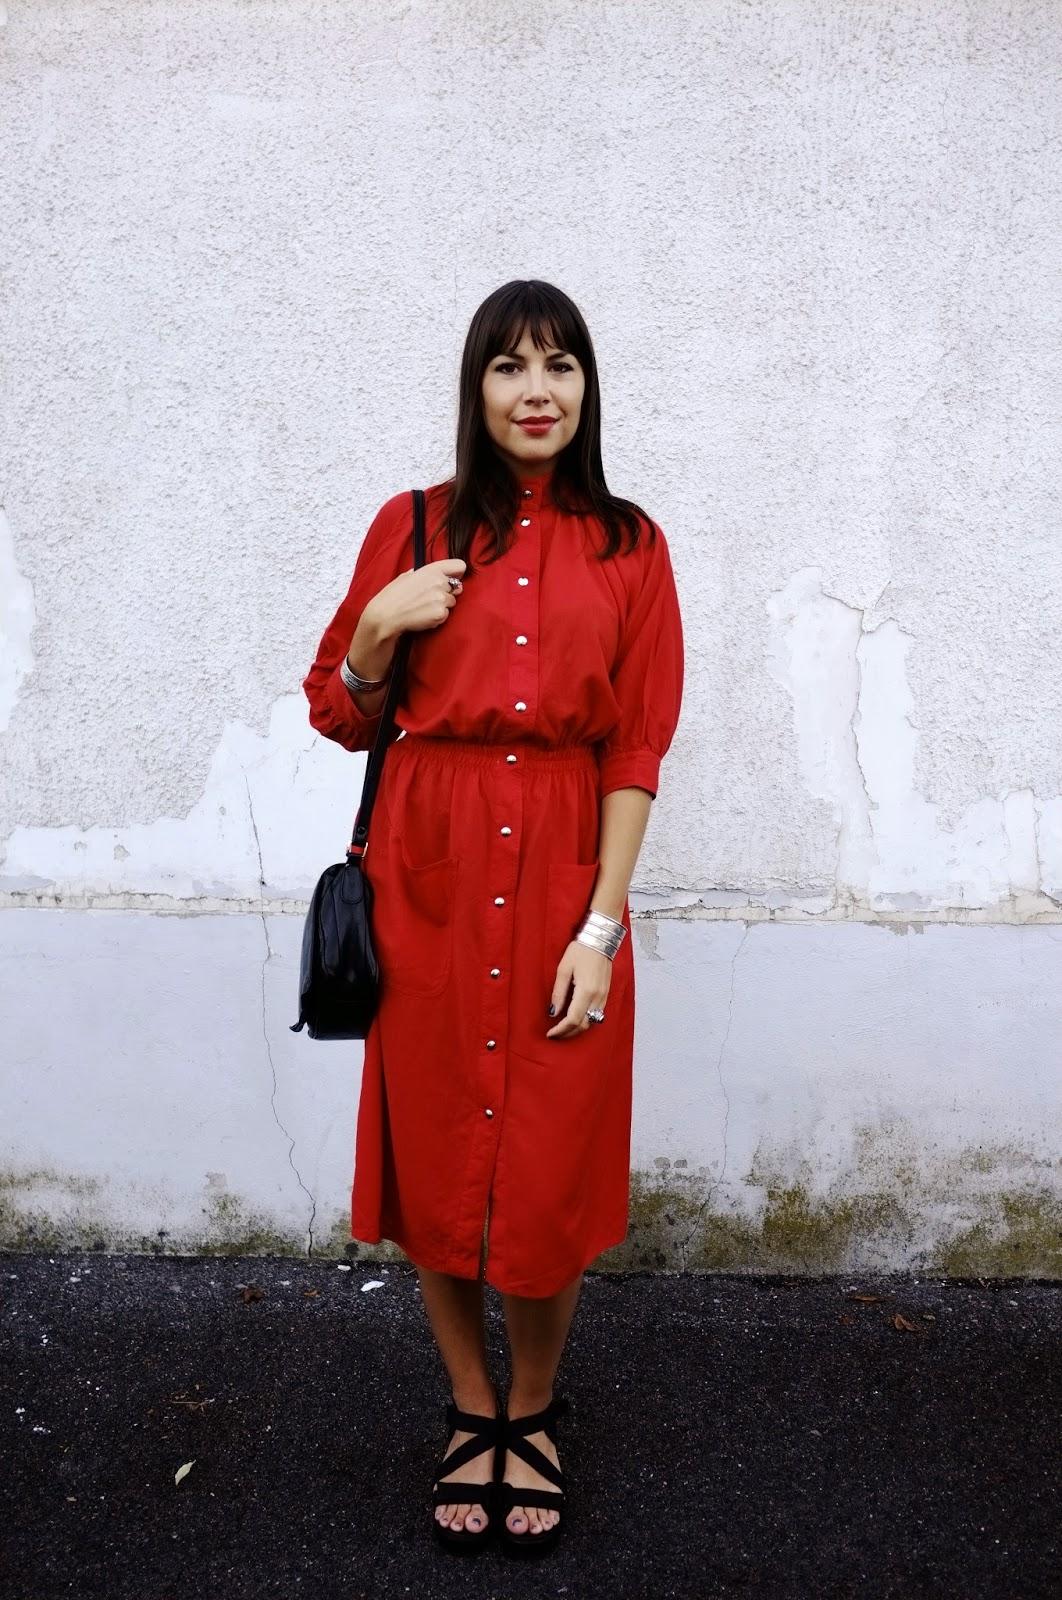 http://ielonah.blogspot.fr/2014/09/robe-rouge-vintage.html